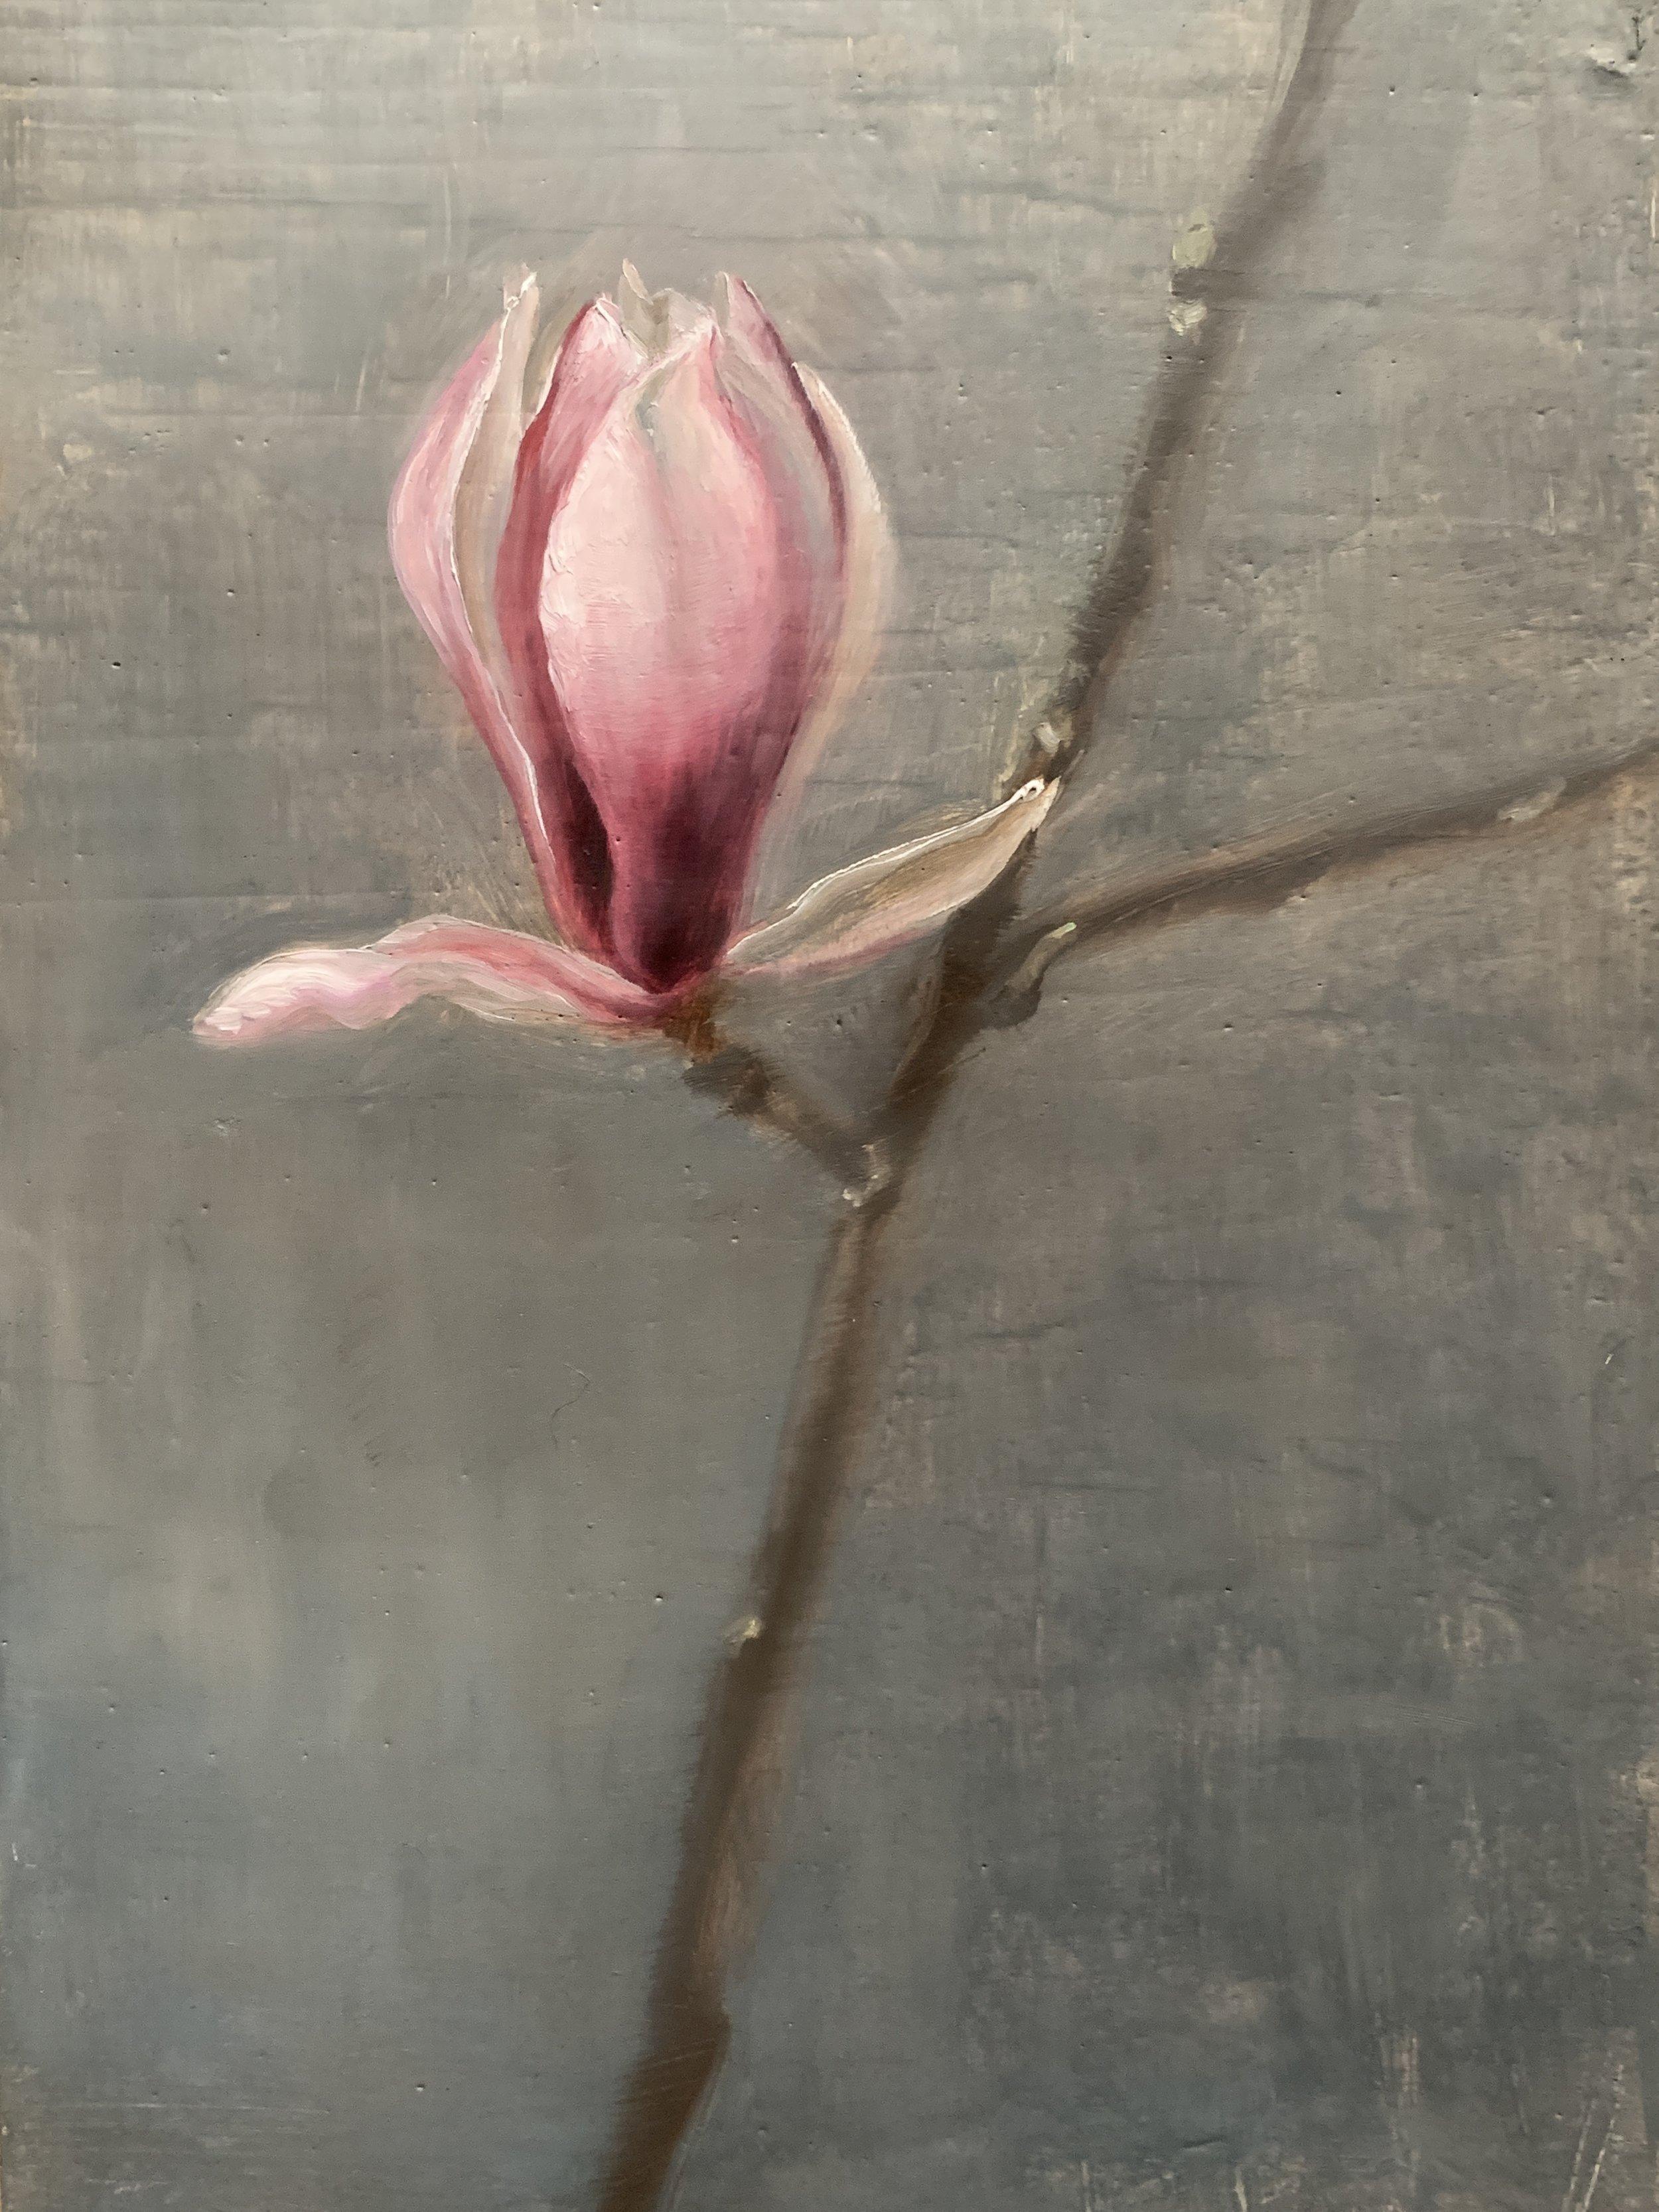 Magnolia Flower in Dancer Pose